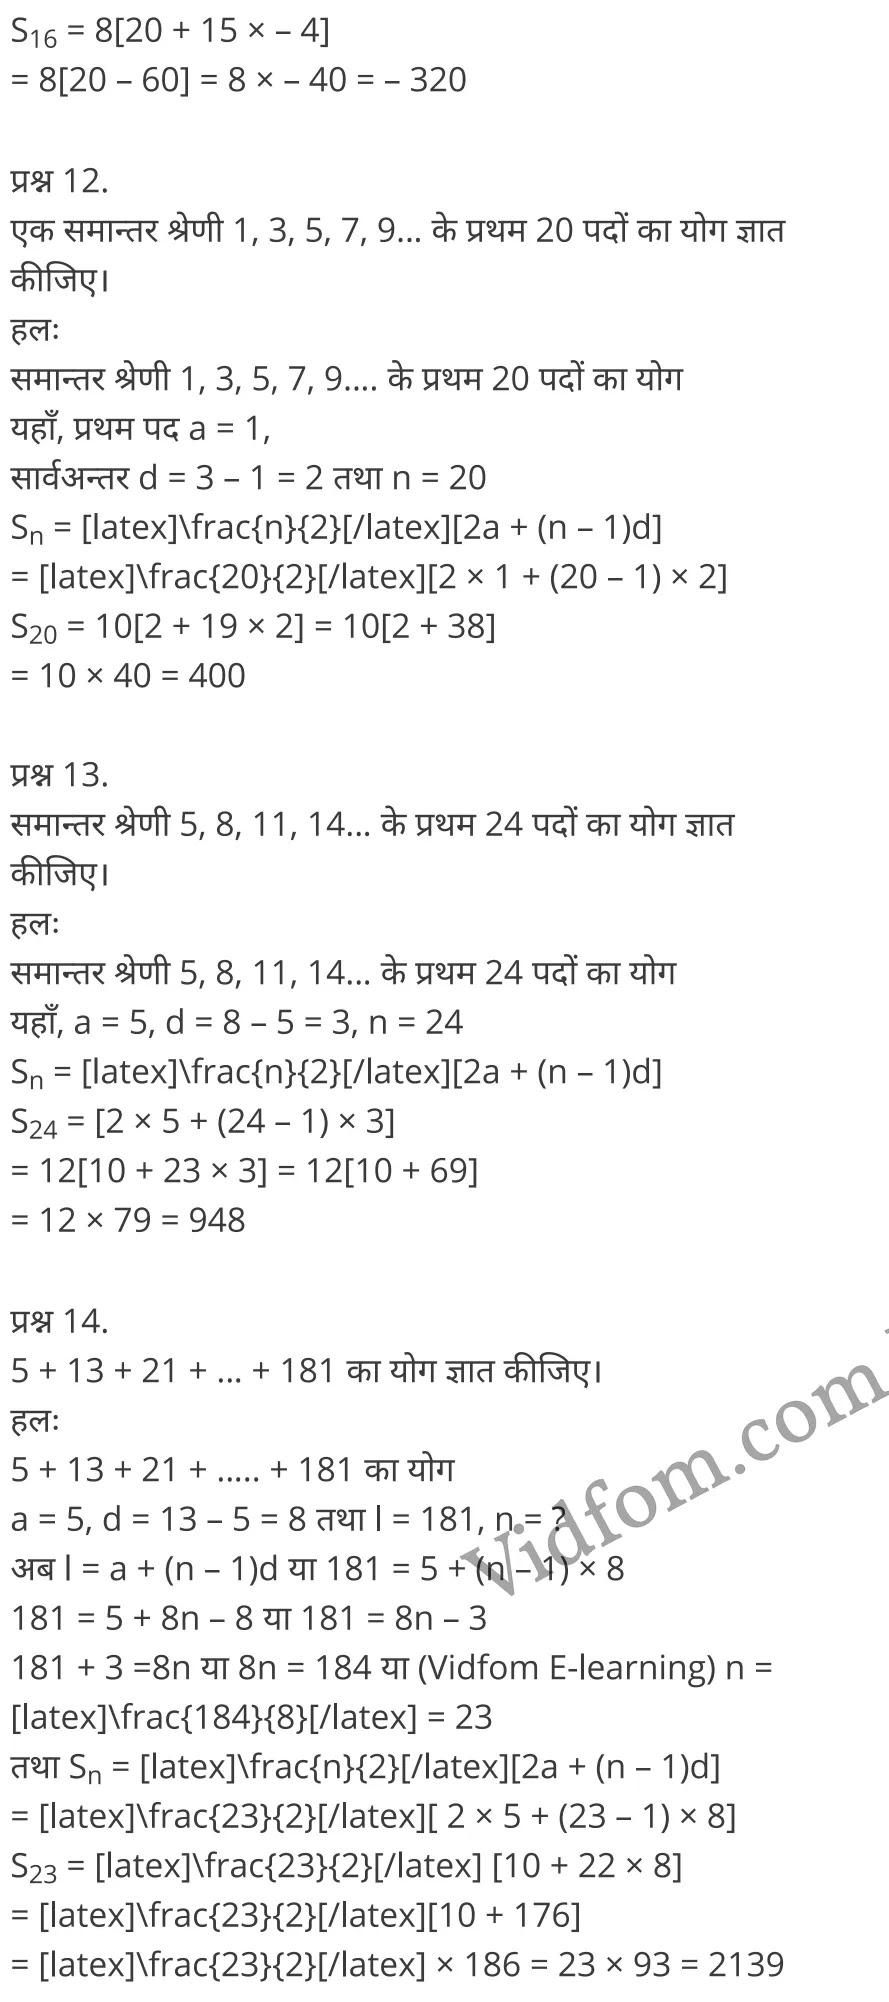 Chapter 5 Quadratic Equations Ex 5.1 Chapter 5 Quadratic Equations Ex 5.2 Chapter 5 Quadratic Equations Ex 5.3 Chapter 5 Quadratic Equations Ex 5.4 Chapter 5 Quadratic Equations Ex 5.5 कक्षा 10 बालाजी गणित  के नोट्स  हिंदी में एनसीईआरटी समाधान,     class 10 Balaji Maths Chapter 5,   class 10 Balaji Maths Chapter 5 ncert solutions in Hindi,   class 10 Balaji Maths Chapter 5 notes in hindi,   class 10 Balaji Maths Chapter 5 question answer,   class 10 Balaji Maths Chapter 5 notes,   class 10 Balaji Maths Chapter 5 class 10 Balaji Maths Chapter 5 in  hindi,    class 10 Balaji Maths Chapter 5 important questions in  hindi,   class 10 Balaji Maths Chapter 5 notes in hindi,    class 10 Balaji Maths Chapter 5 test,   class 10 Balaji Maths Chapter 5 pdf,   class 10 Balaji Maths Chapter 5 notes pdf,   class 10 Balaji Maths Chapter 5 exercise solutions,   class 10 Balaji Maths Chapter 5 notes study rankers,   class 10 Balaji Maths Chapter 5 notes,    class 10 Balaji Maths Chapter 5  class 10  notes pdf,   class 10 Balaji Maths Chapter 5 class 10  notes  ncert,   class 10 Balaji Maths Chapter 5 class 10 pdf,   class 10 Balaji Maths Chapter 5  book,   class 10 Balaji Maths Chapter 5 quiz class 10  ,    10  th class 10 Balaji Maths Chapter 5  book up board,   up board 10  th class 10 Balaji Maths Chapter 5 notes,  class 10 Balaji Maths,   class 10 Balaji Maths ncert solutions in Hindi,   class 10 Balaji Maths notes in hindi,   class 10 Balaji Maths question answer,   class 10 Balaji Maths notes,  class 10 Balaji Maths class 10 Balaji Maths Chapter 5 in  hindi,    class 10 Balaji Maths important questions in  hindi,   class 10 Balaji Maths notes in hindi,    class 10 Balaji Maths test,  class 10 Balaji Maths class 10 Balaji Maths Chapter 5 pdf,   class 10 Balaji Maths notes pdf,   class 10 Balaji Maths exercise solutions,   class 10 Balaji Maths,  class 10 Balaji Maths notes study rankers,   class 10 Balaji Maths notes,  class 10 Balaji Maths notes,   class 10 Balaji Maths  class